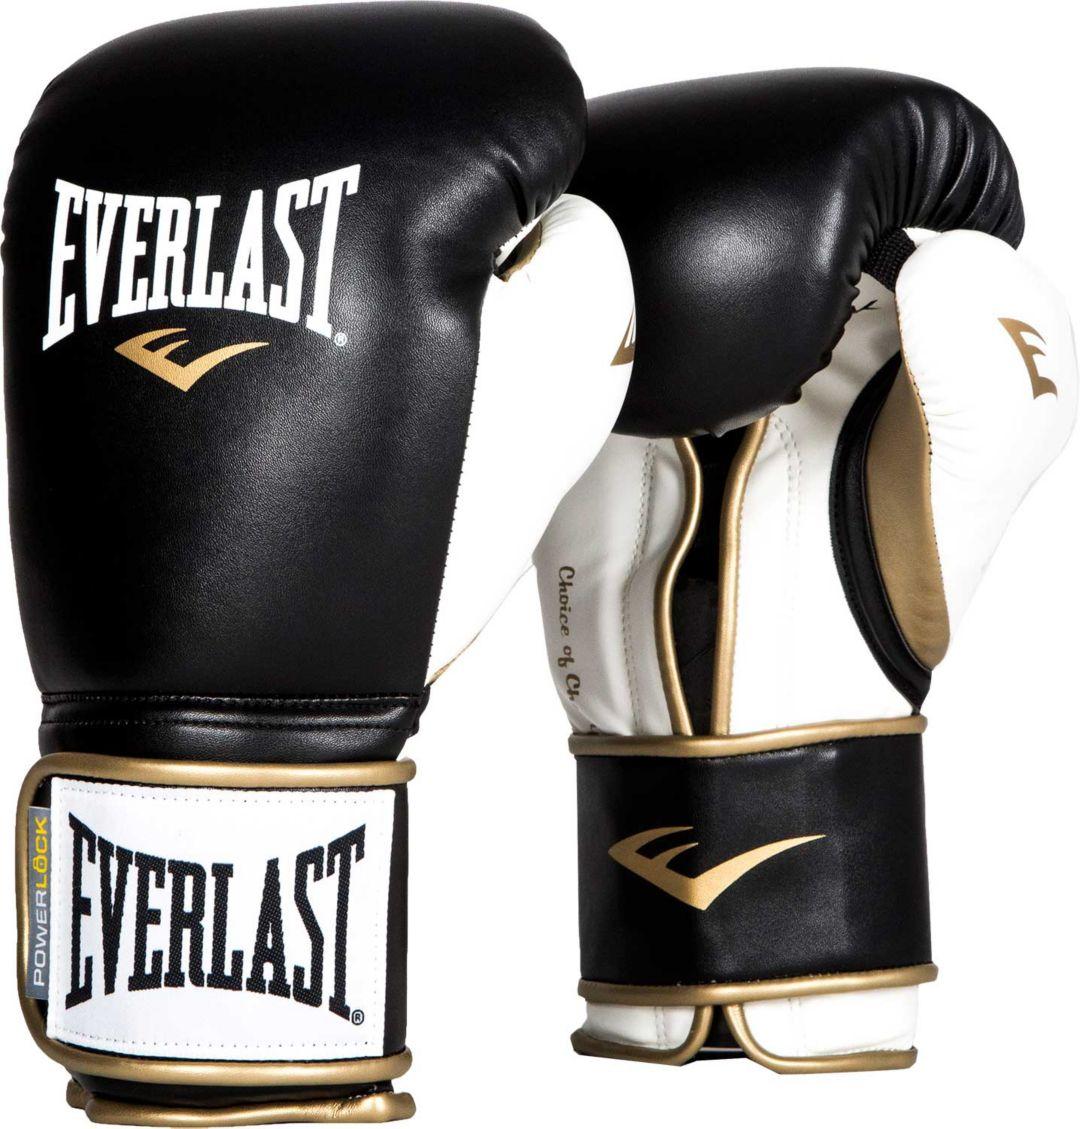 premium selectie 100% topkwaliteit verkoopt Everlast Powerlock Training Gloves